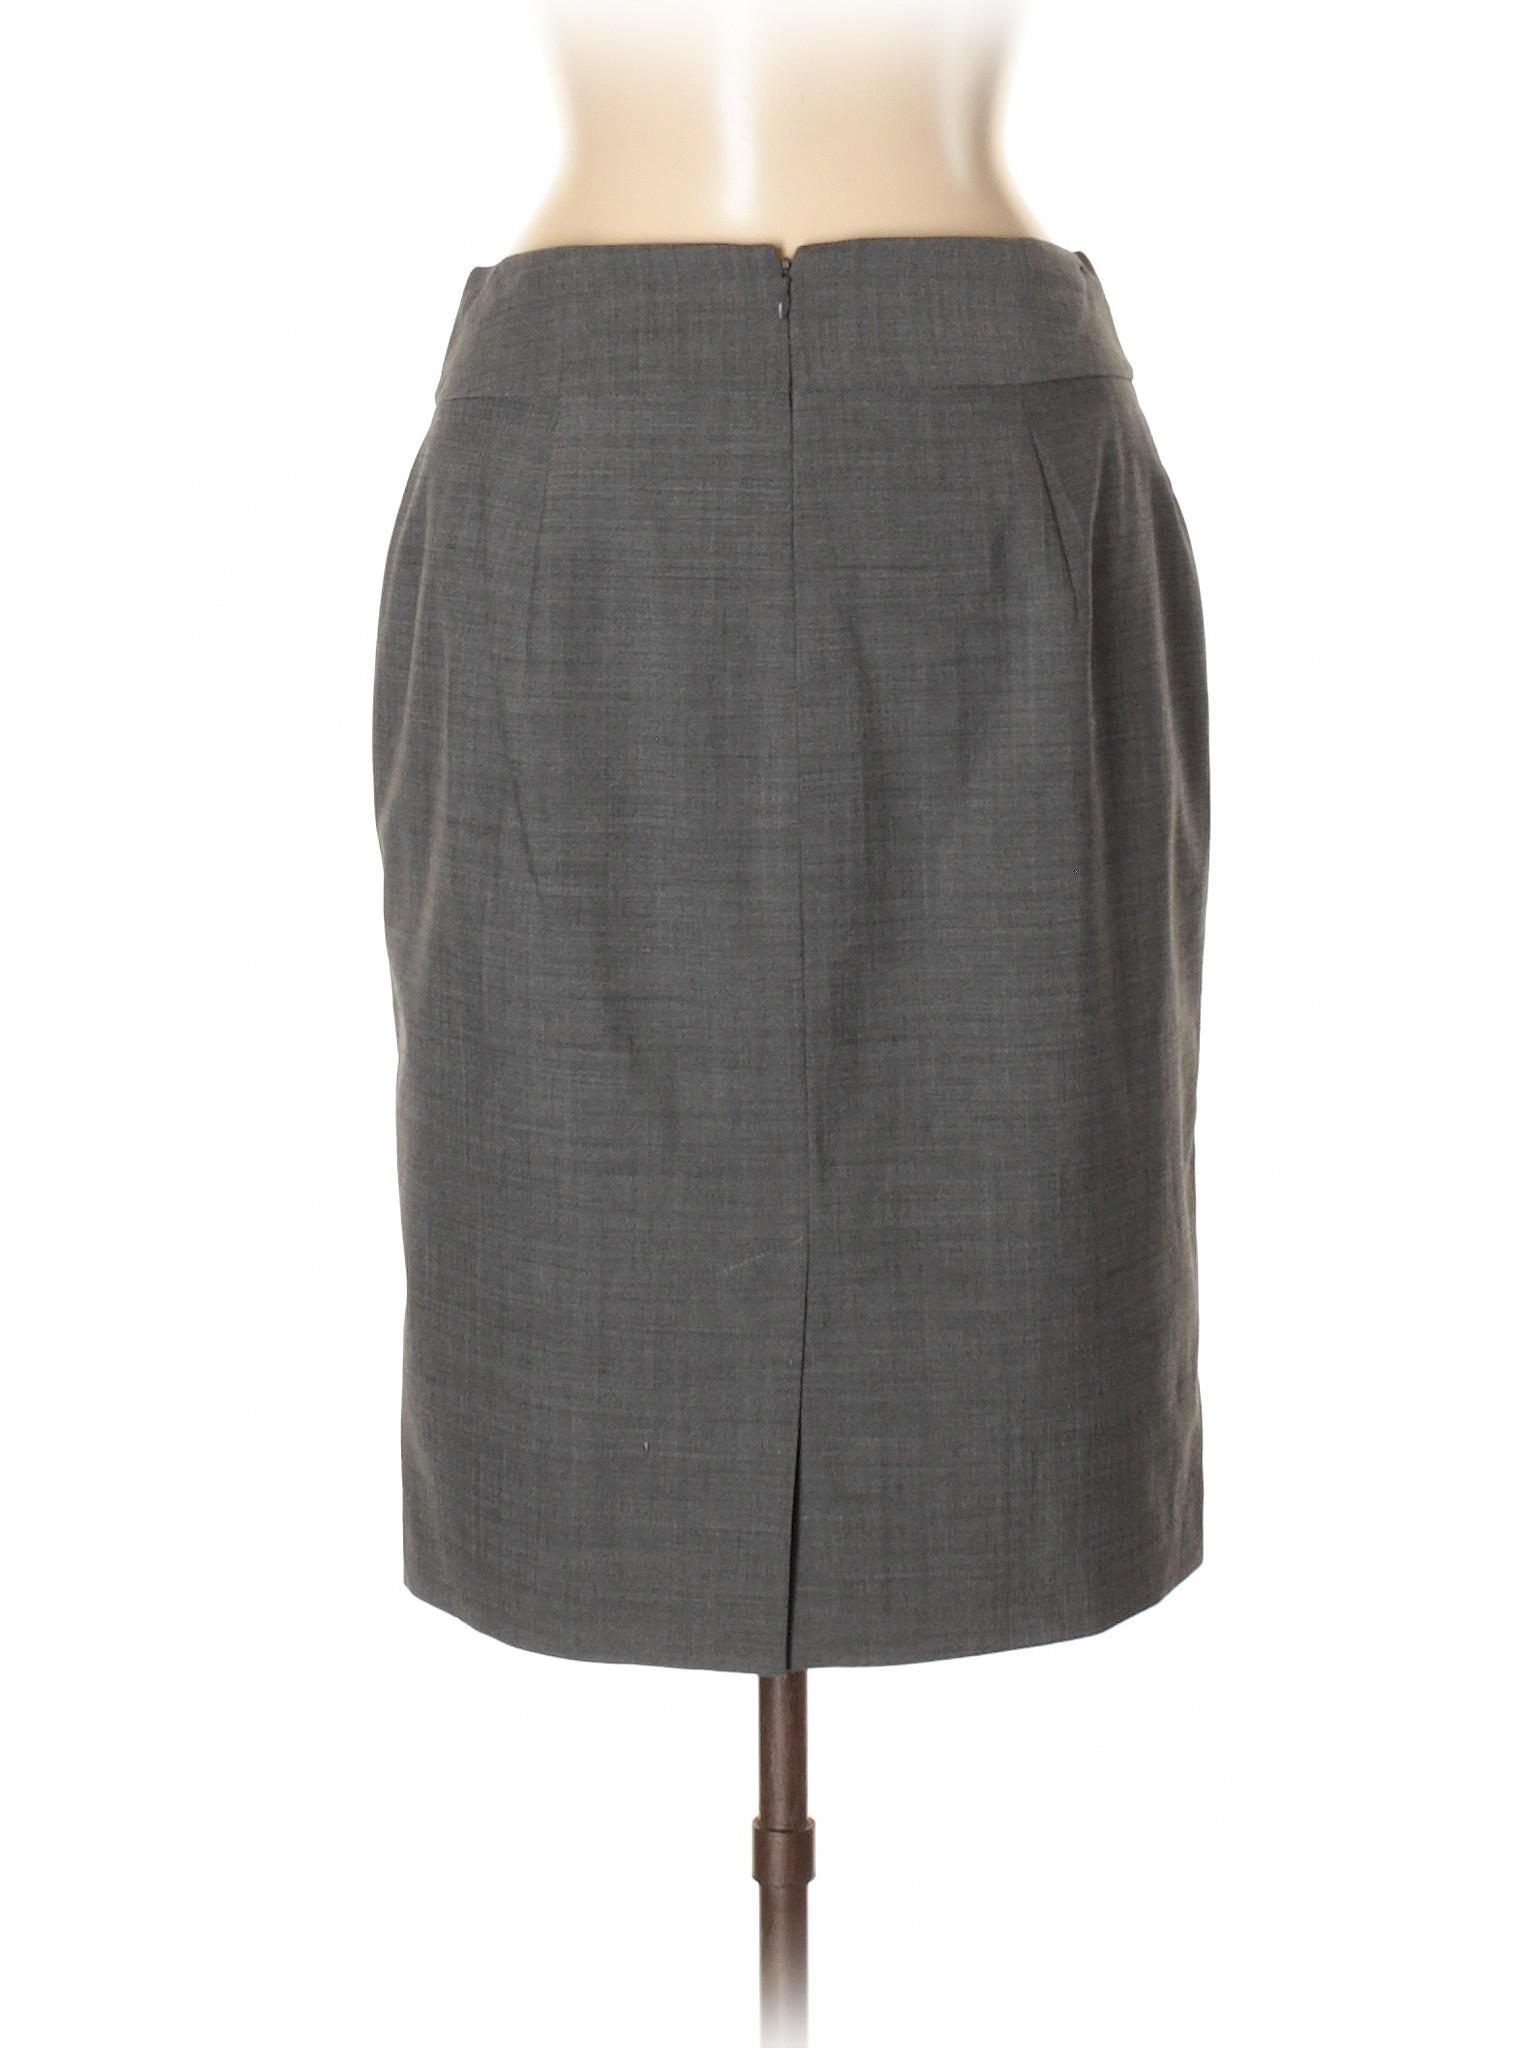 Wool Wool Skirt Boutique Boutique Boutique Wool Skirt Boutique Skirt qIcw8x5FCH